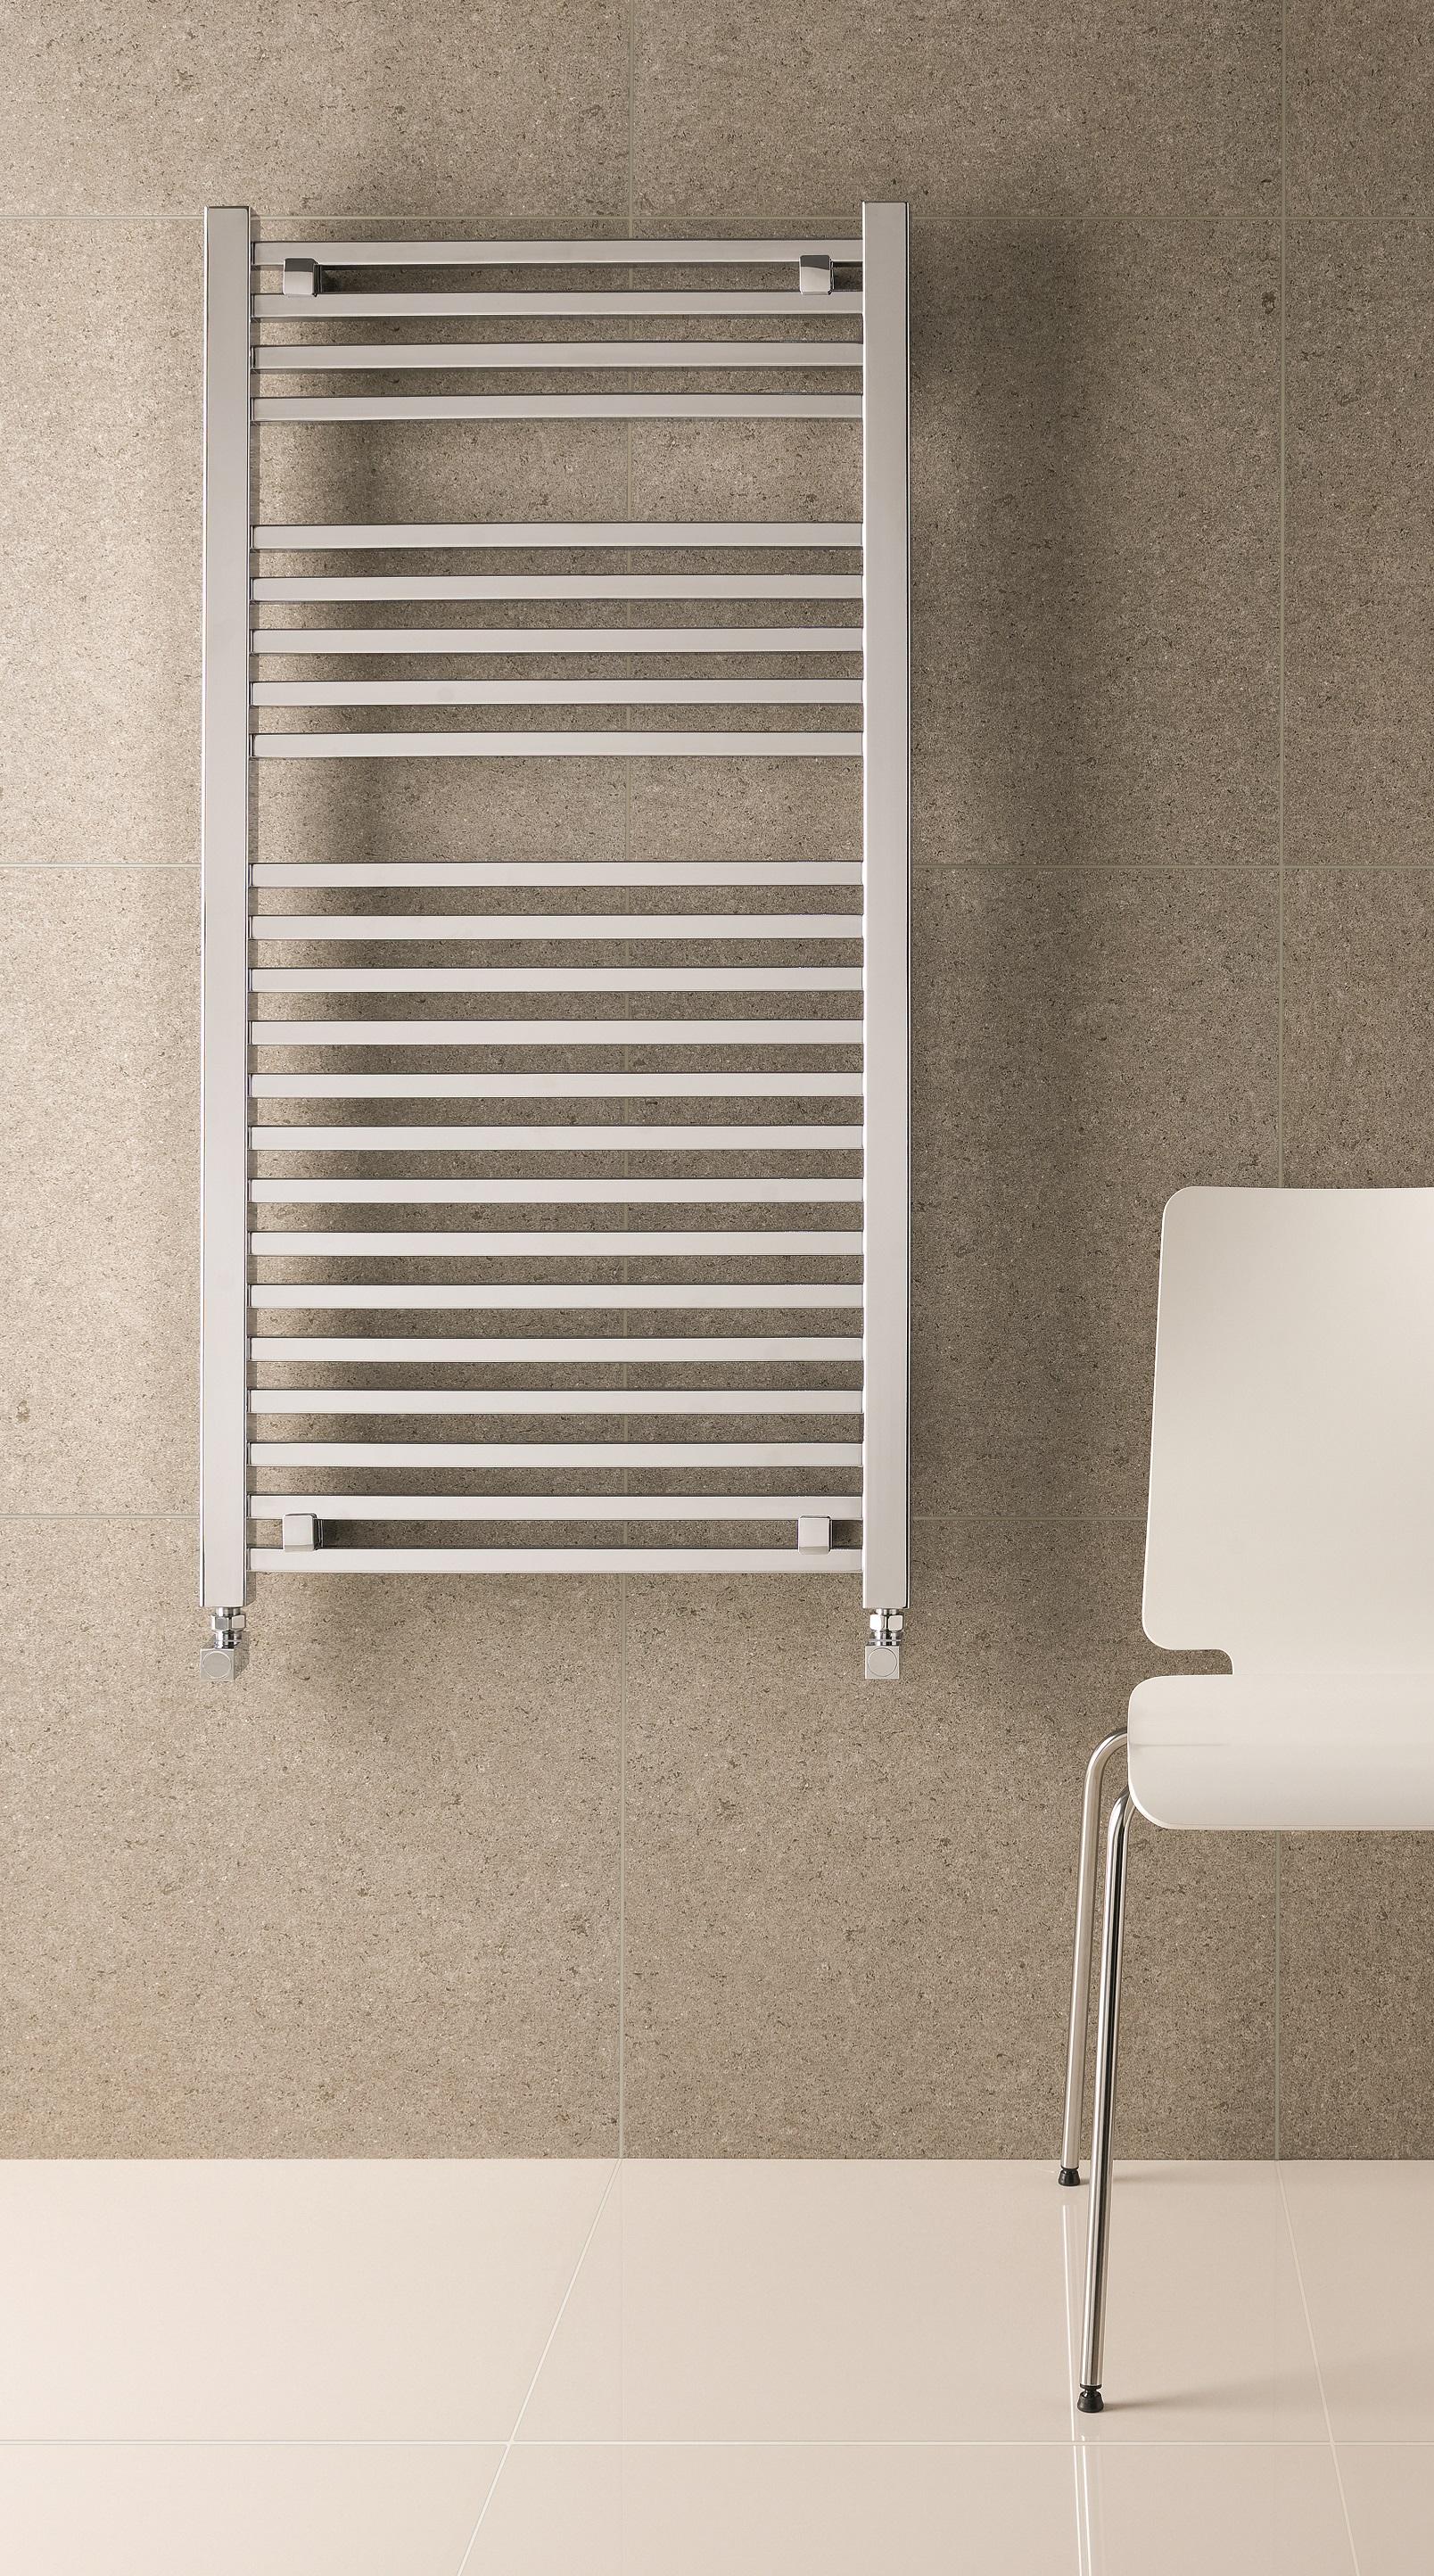 Eastbrook Biava Square handdoek radiator 60x40cm Chroom 221 watt